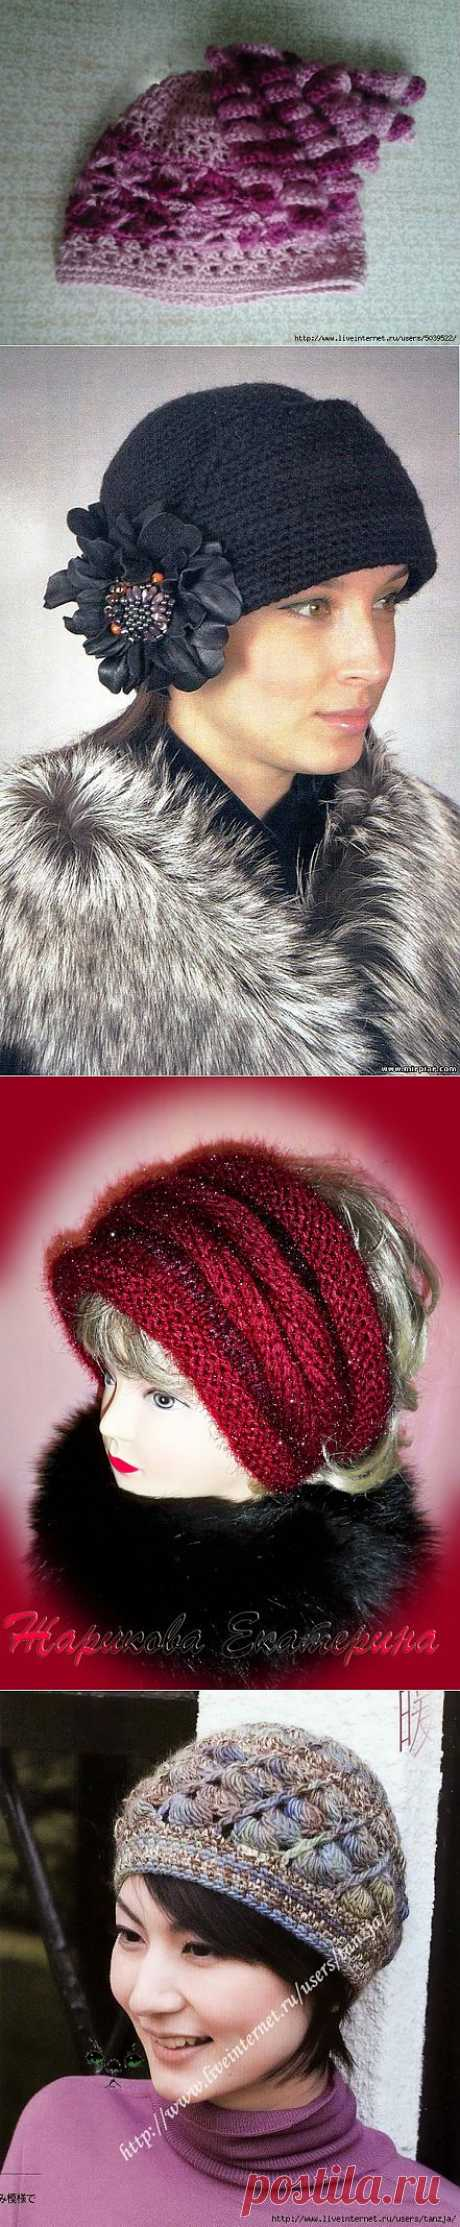 шапки,береты,шарфы | Записи в рубрике шапки,береты,шарфы | Дневник